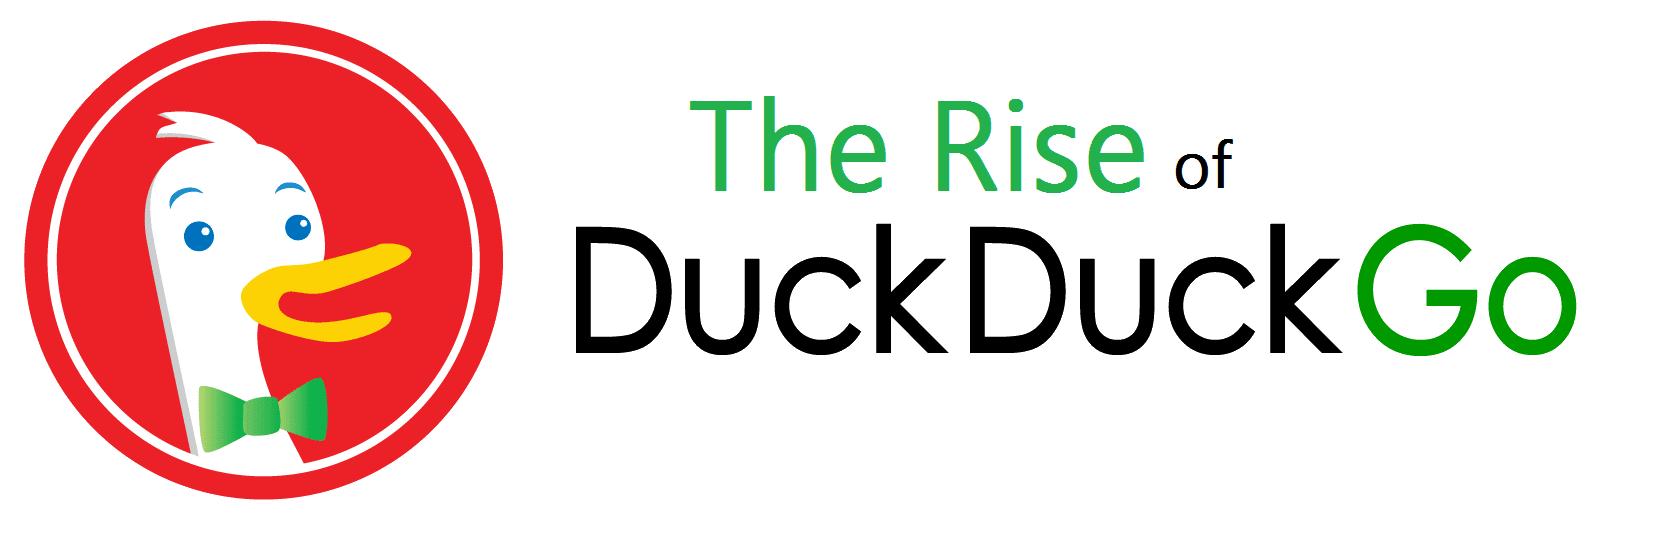 DuckDuckGo Grows 70% this Year